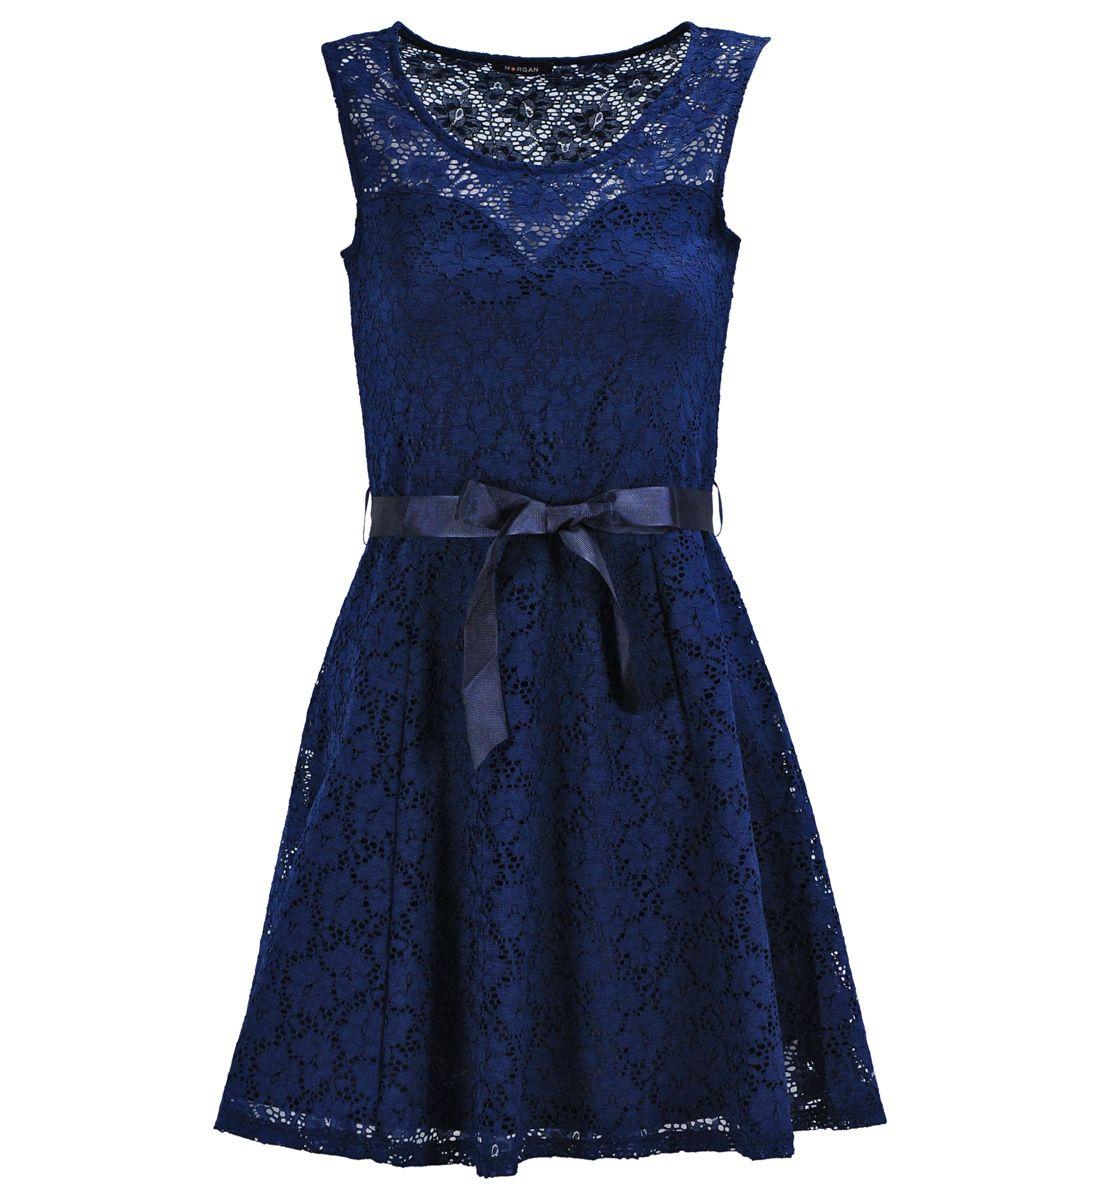 Robe bleu marine morgan